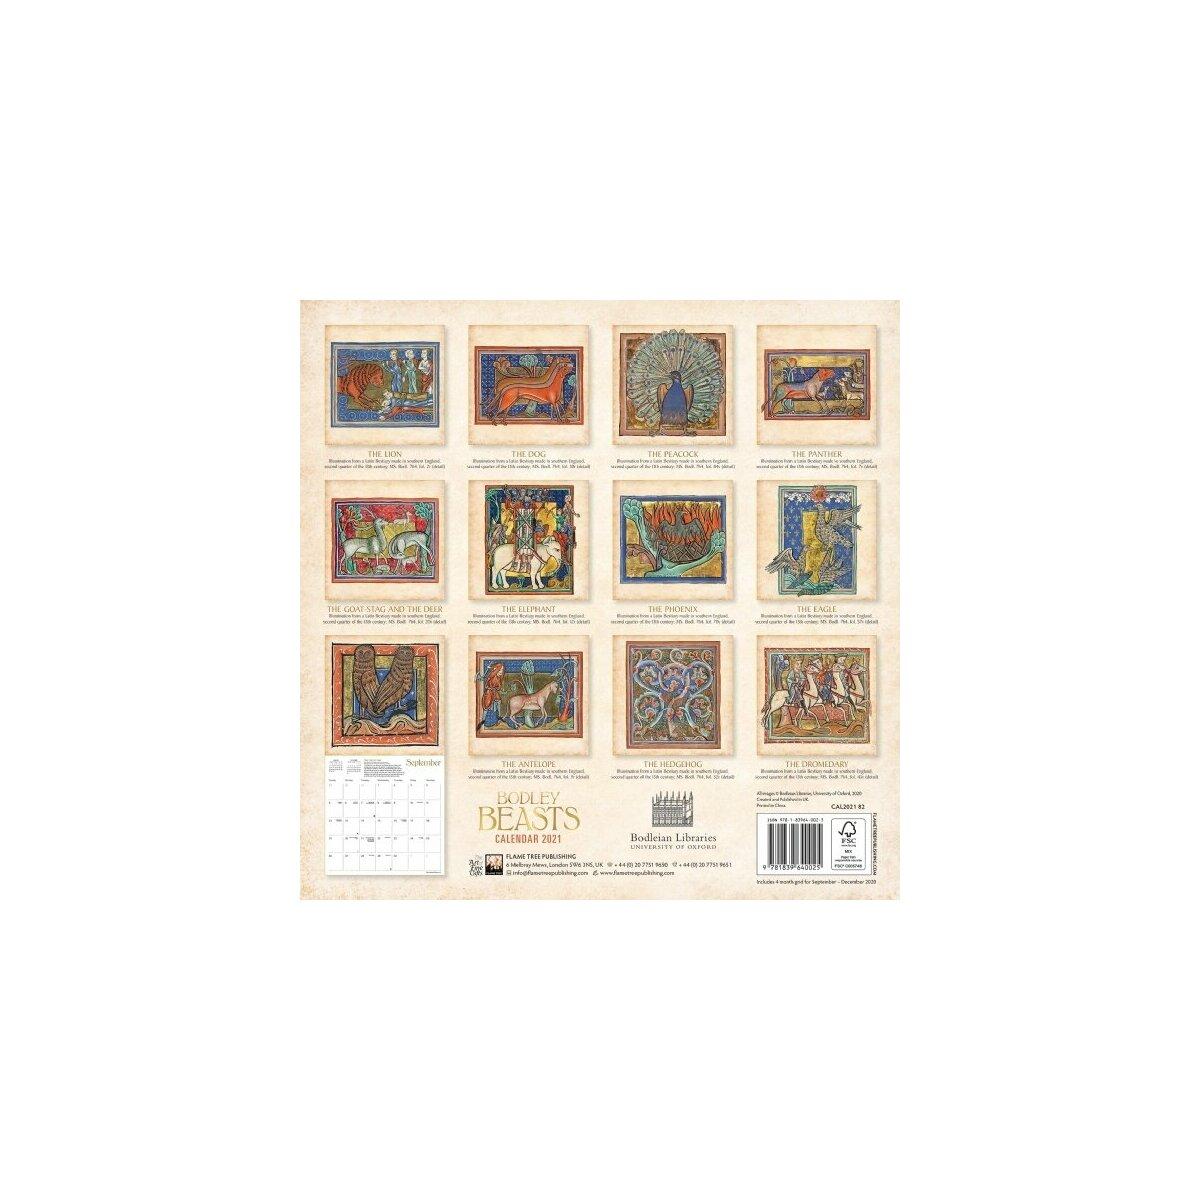 Calendrier 2021 Manuscrit médiéval